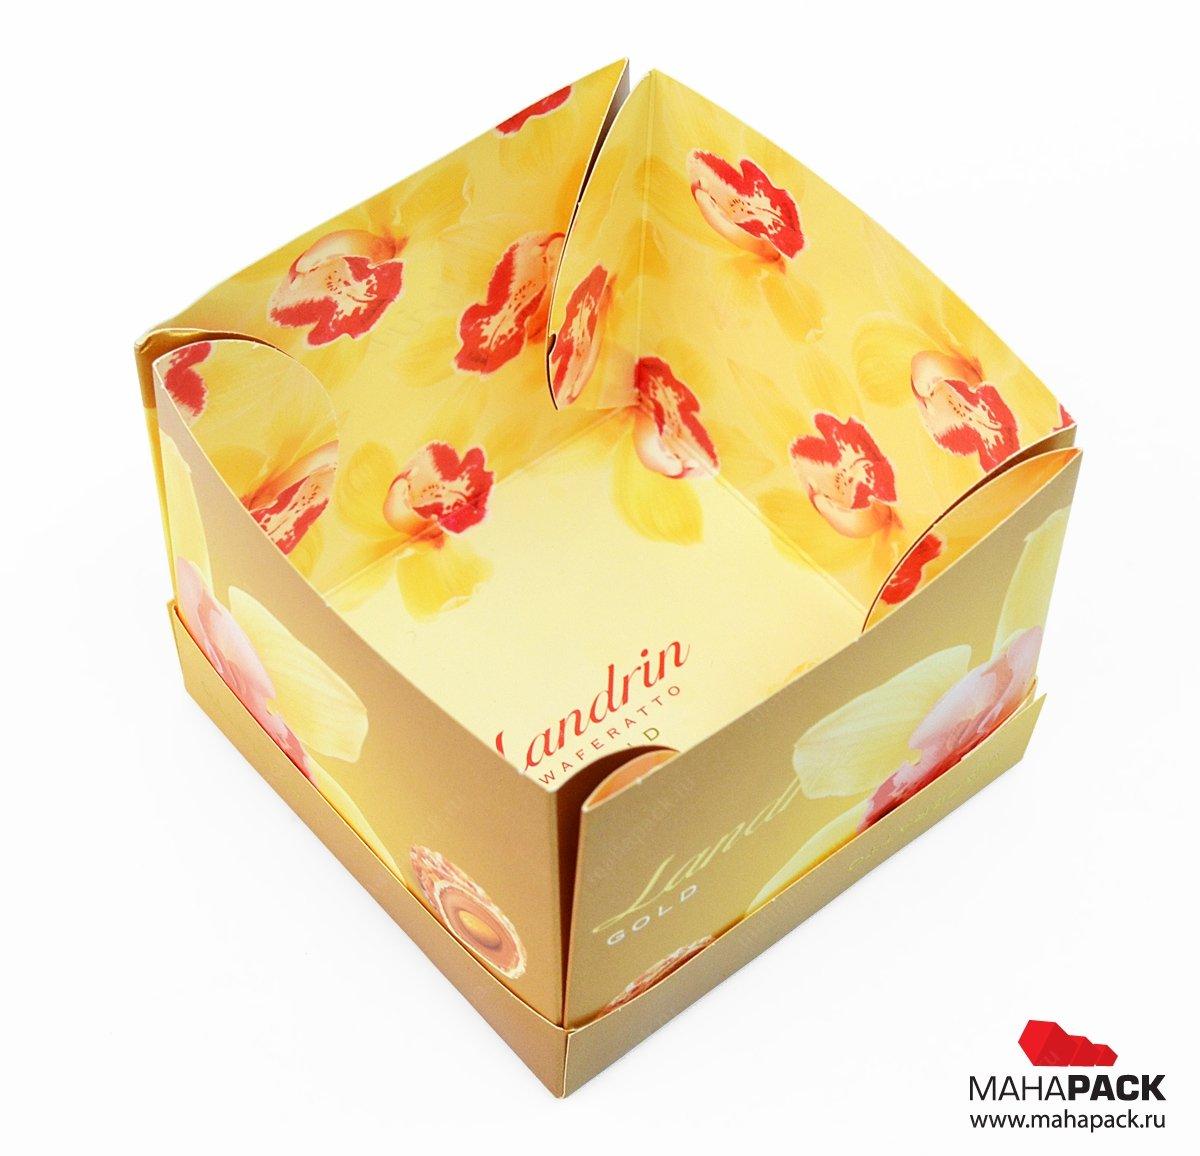 Самосборная коробка - self-pack